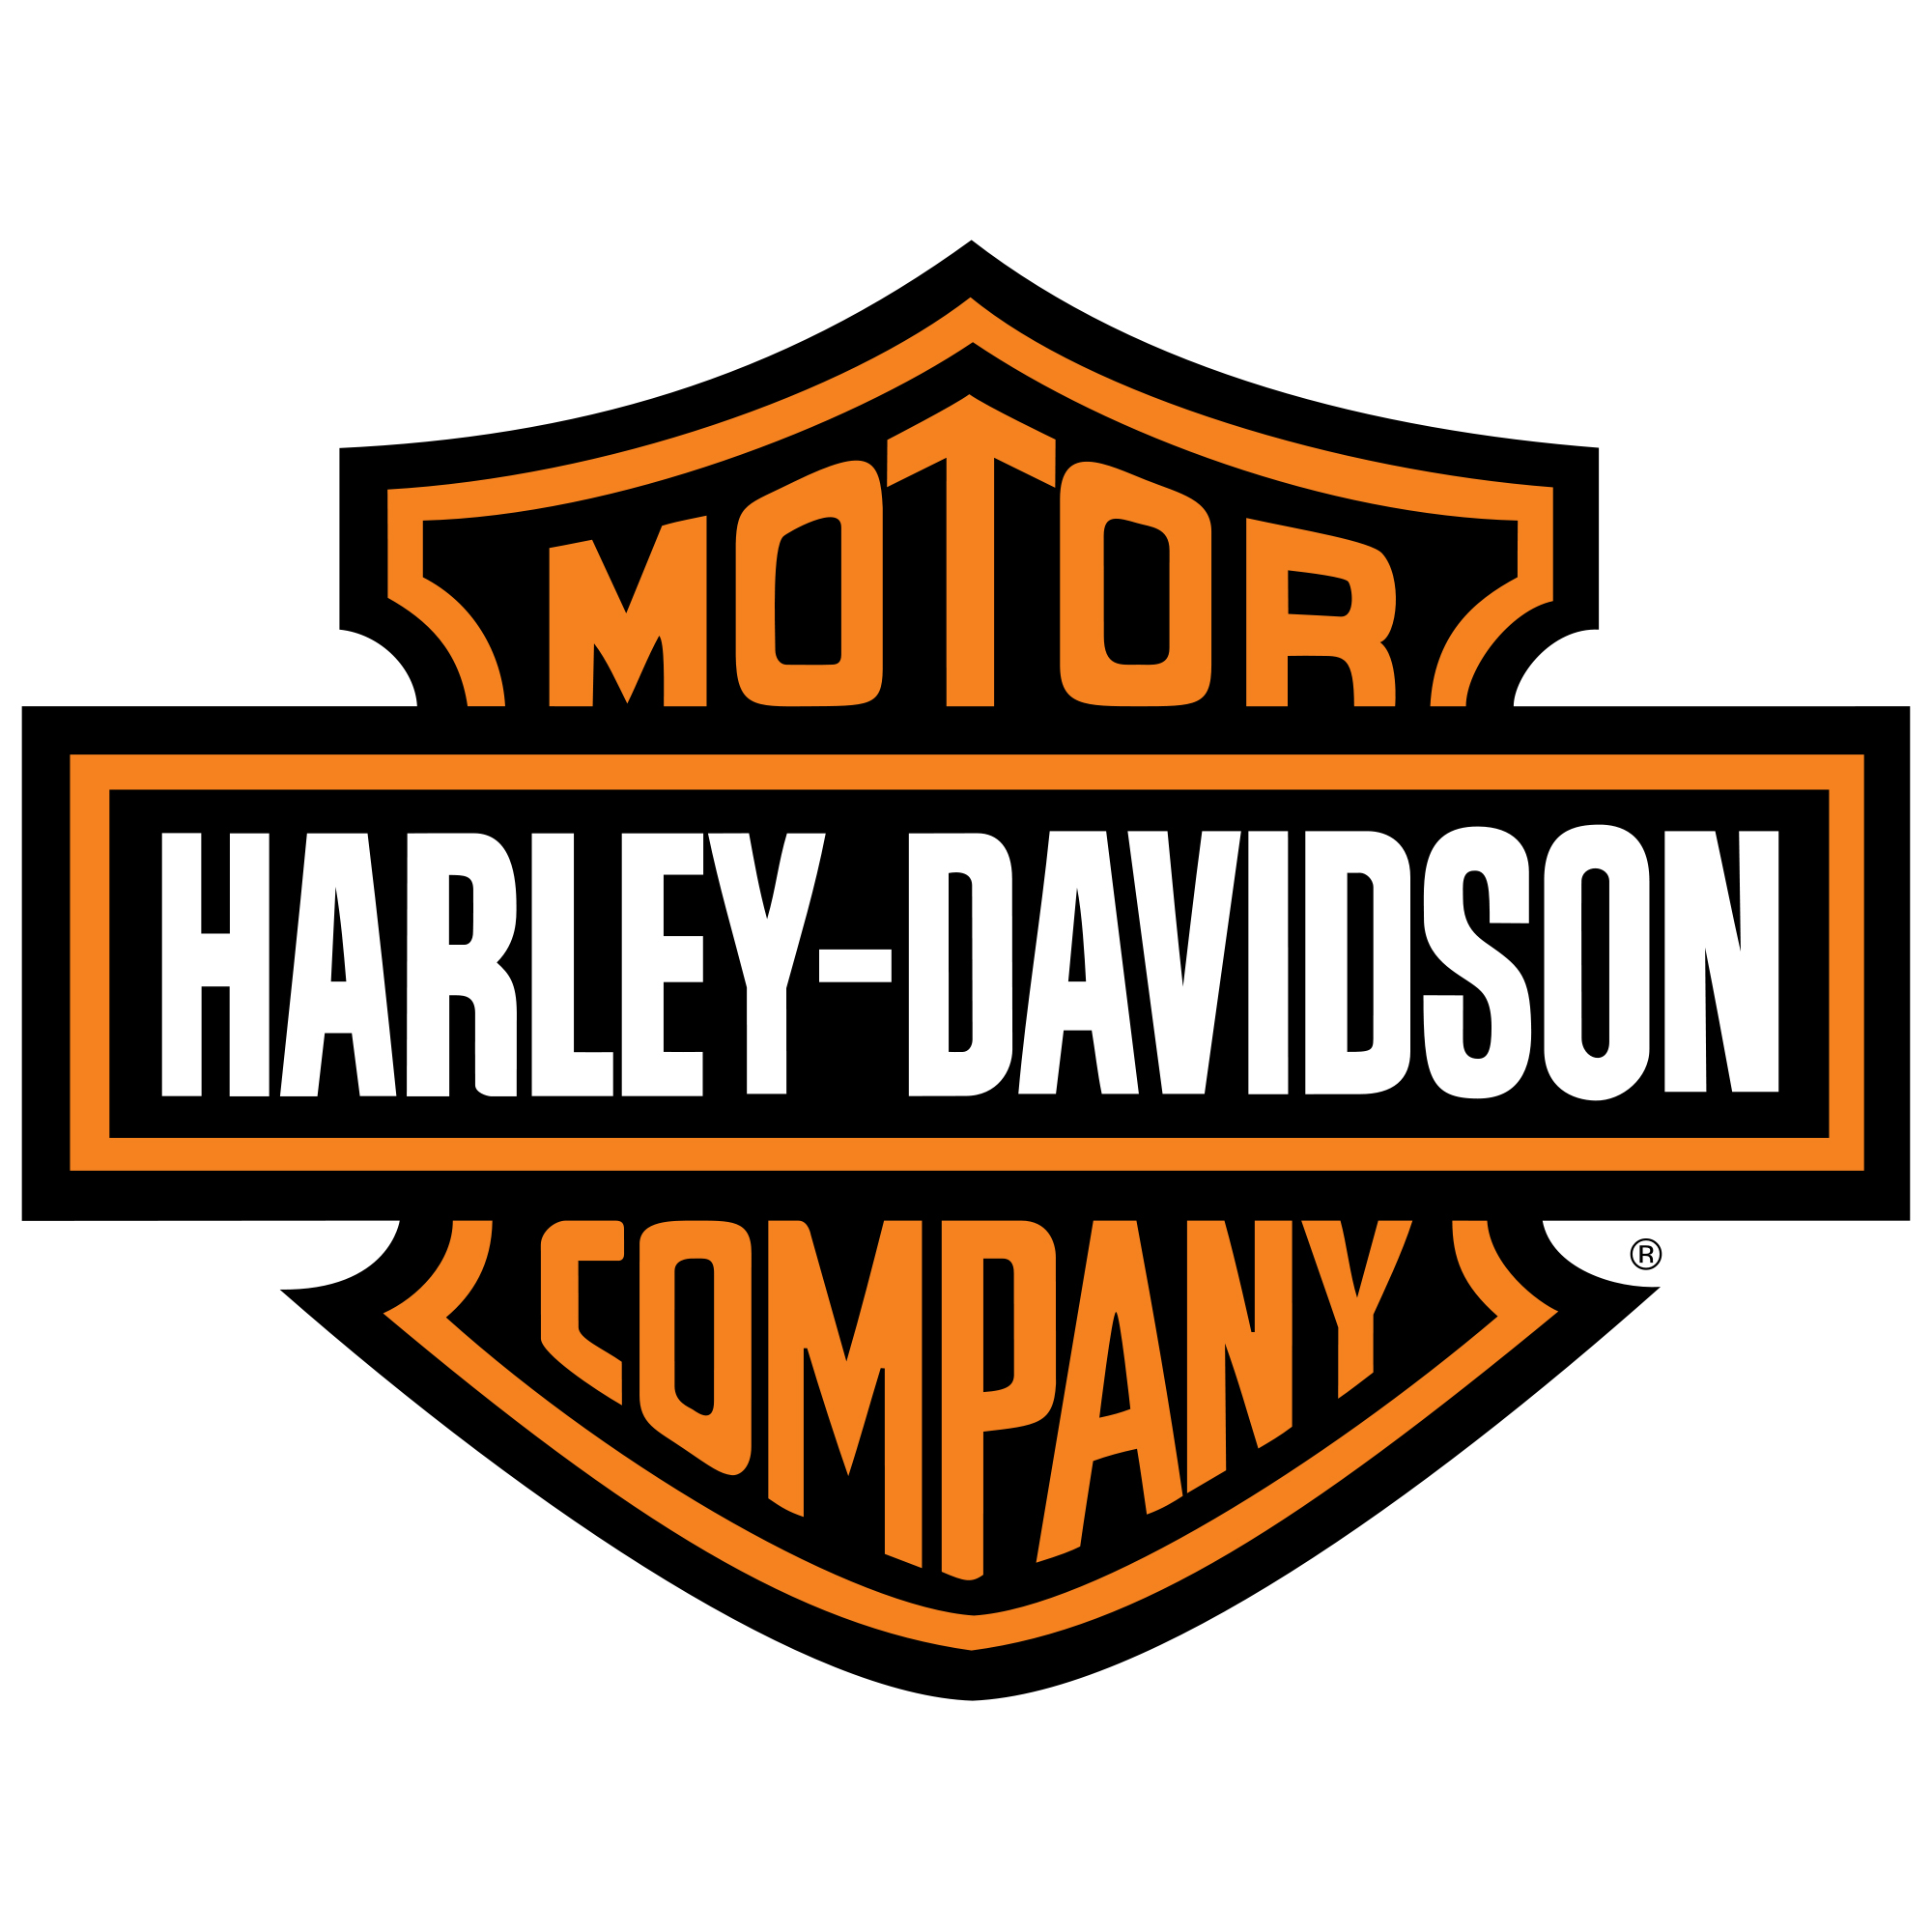 New Castalloy/Harley-Davidson-AUS